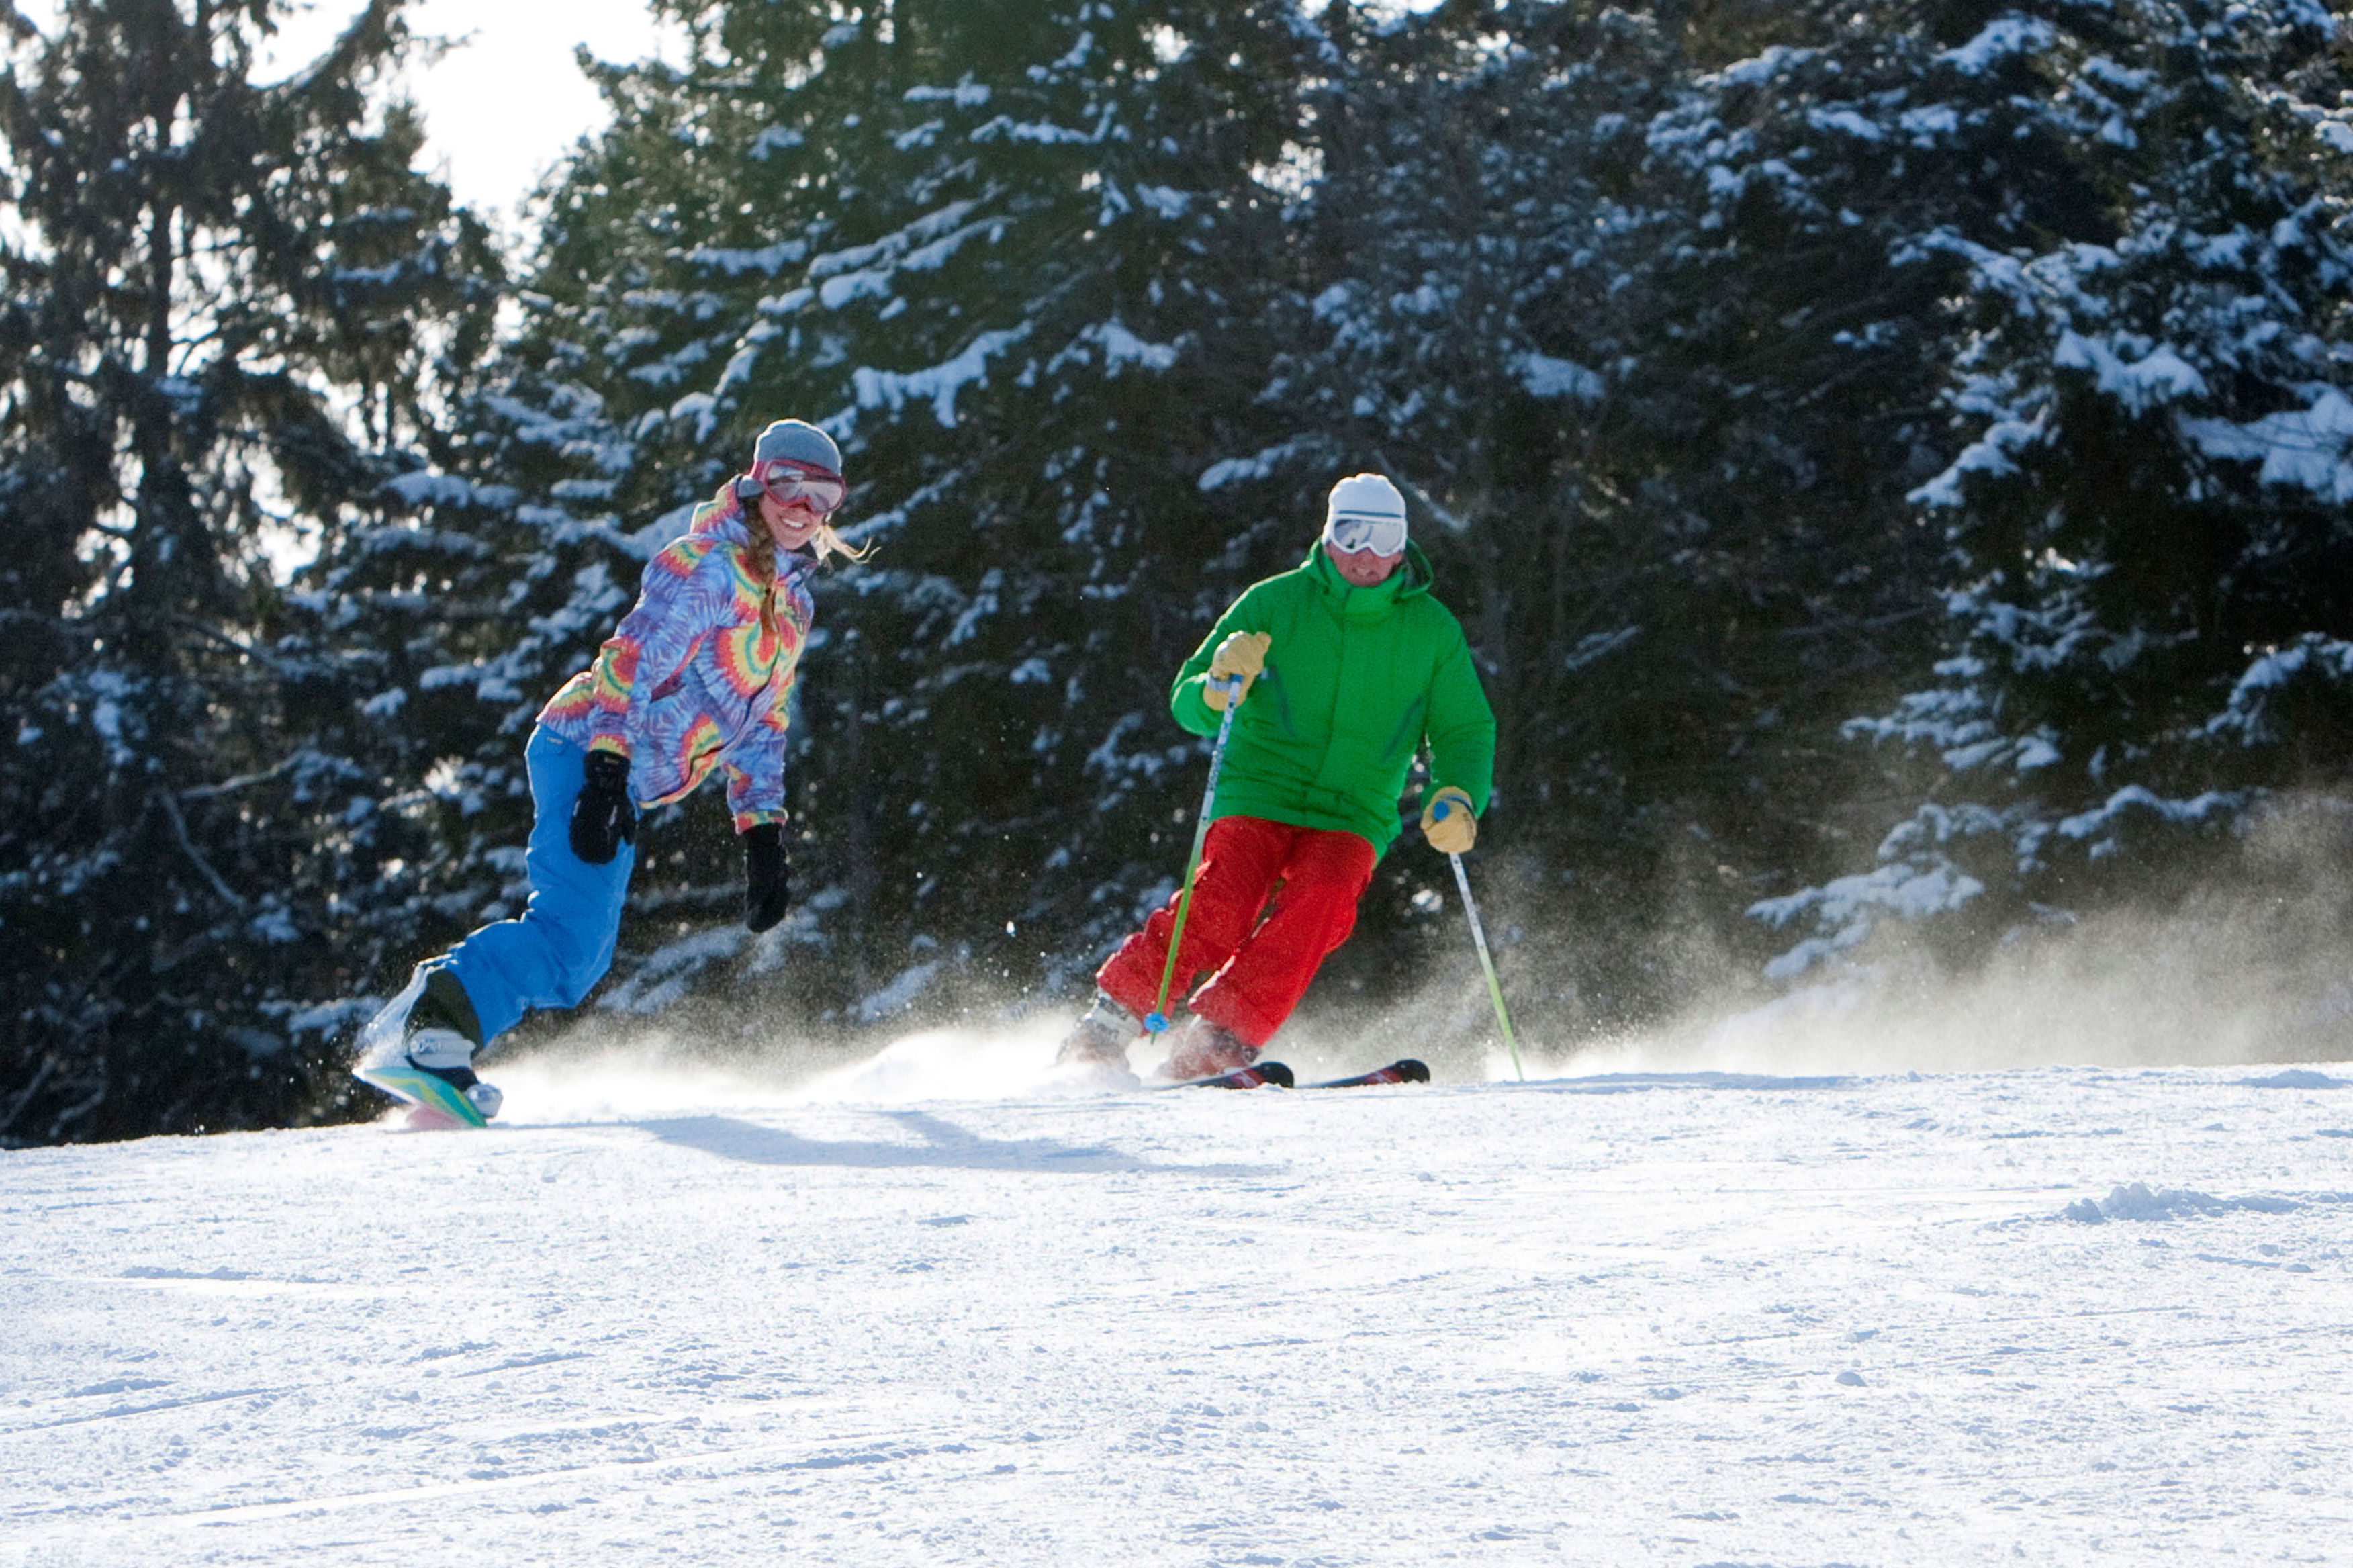 Skiing at Greek Peak